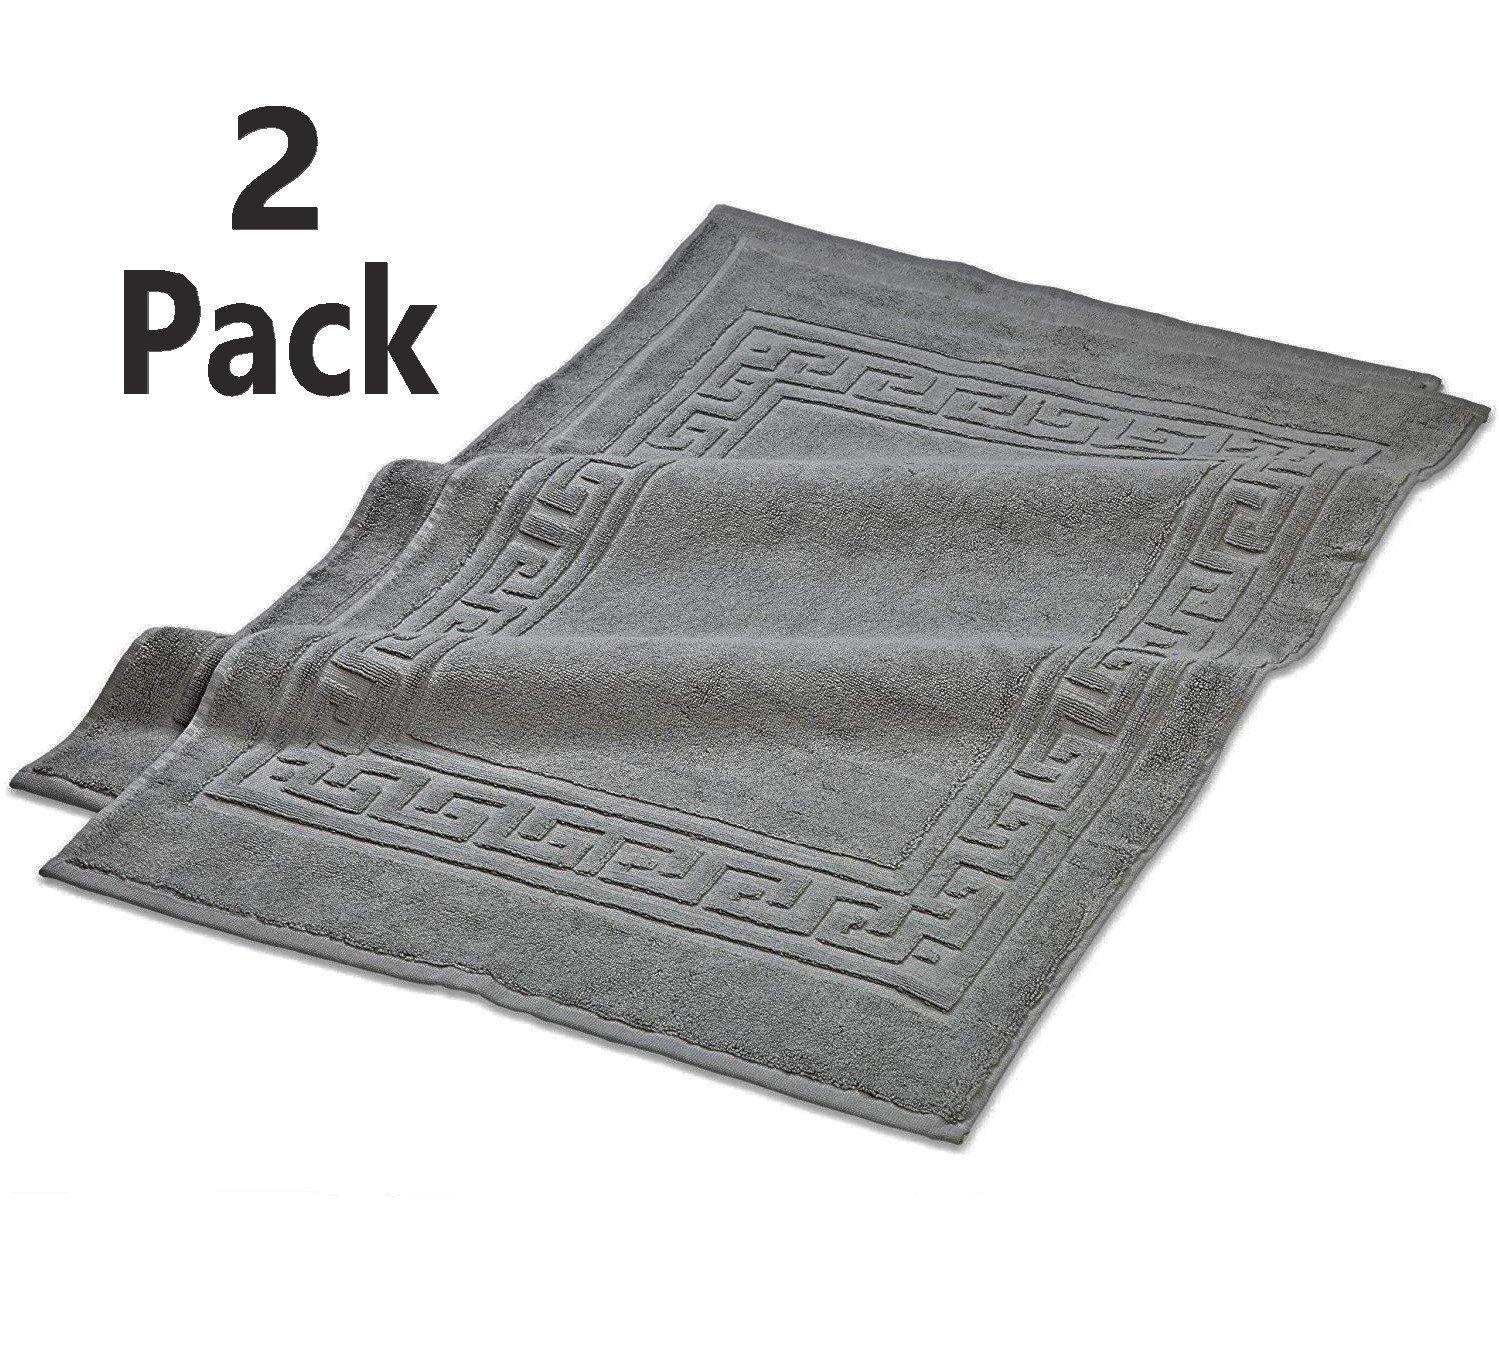 TowelPro Luxury Premium Soft 100% Cotton Highly Absorbent Machine Washable Multi-Purpose, Hotel, Spa, Home, Bath Rug, Set of 2 Bath Mats 20'' X 34'' (Gray)